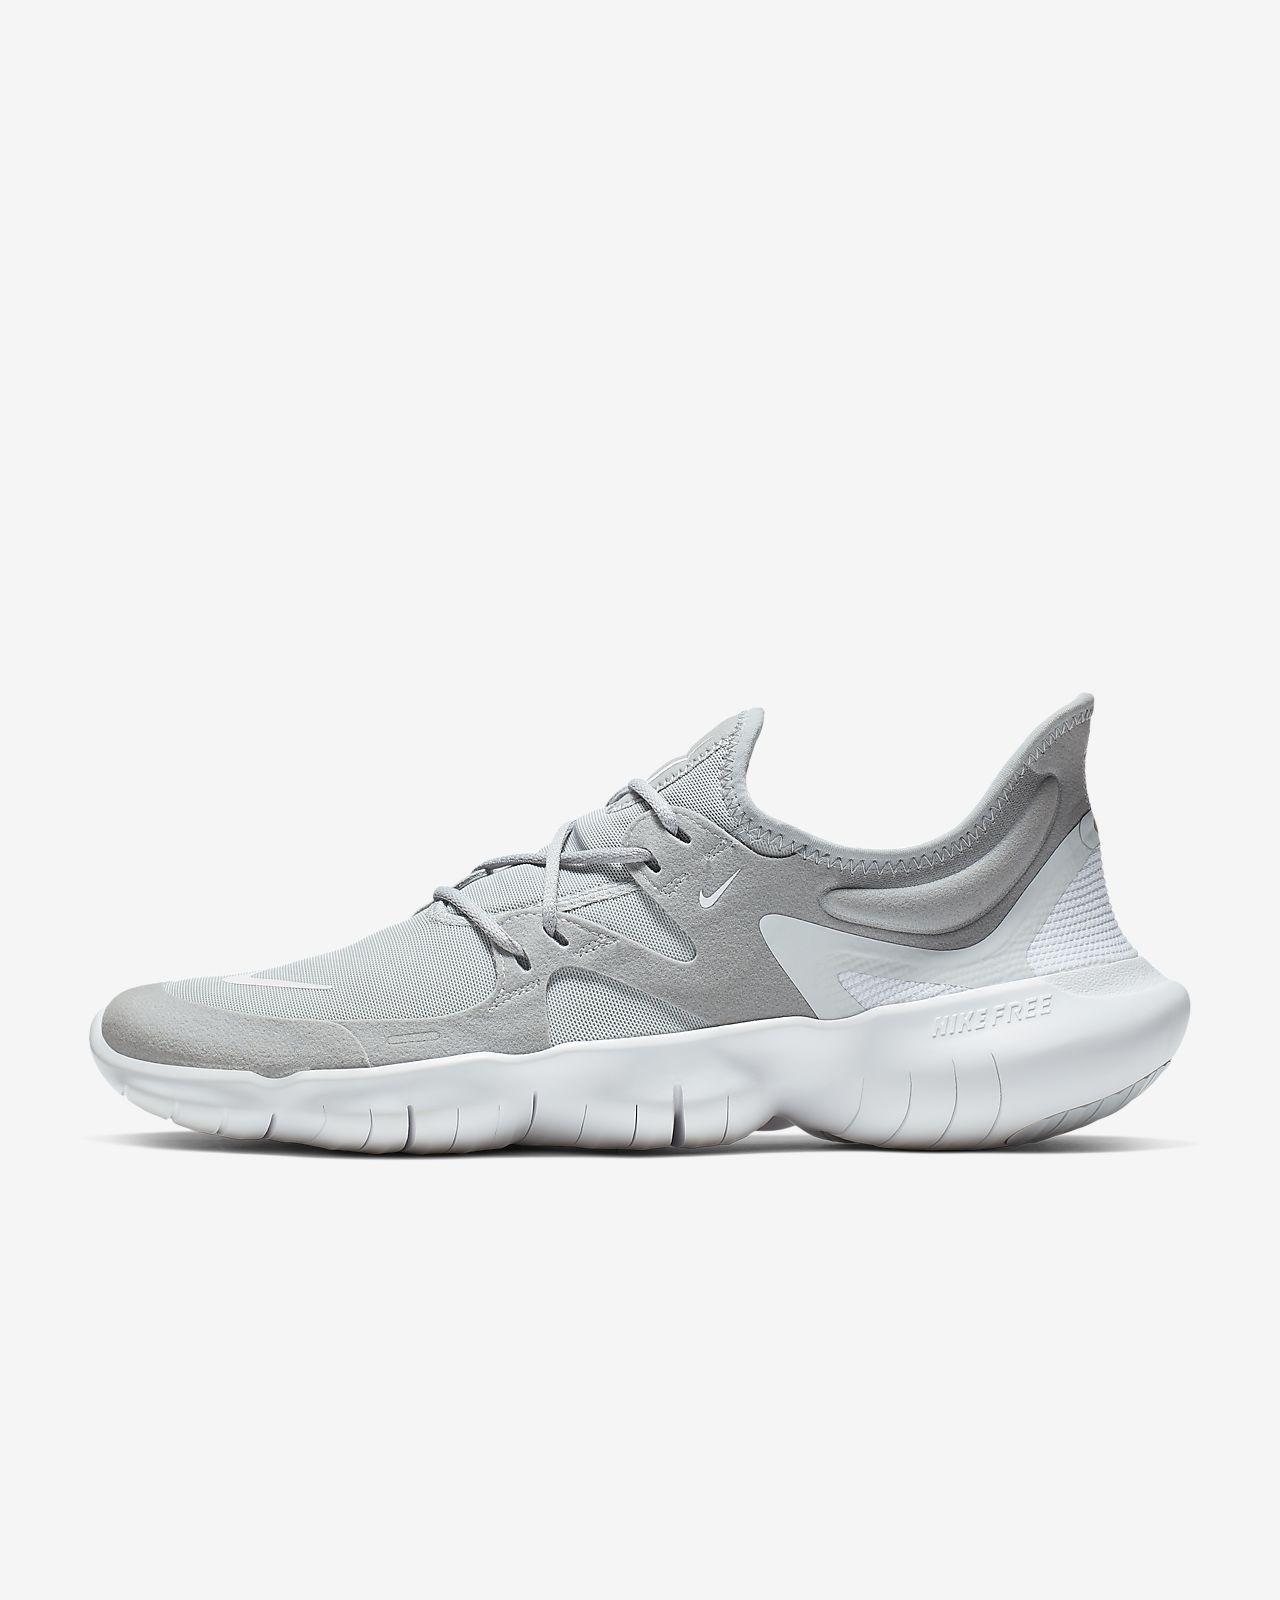 Innovative Designs Womens Nike Free 5.0 Green Wolf Grey Men